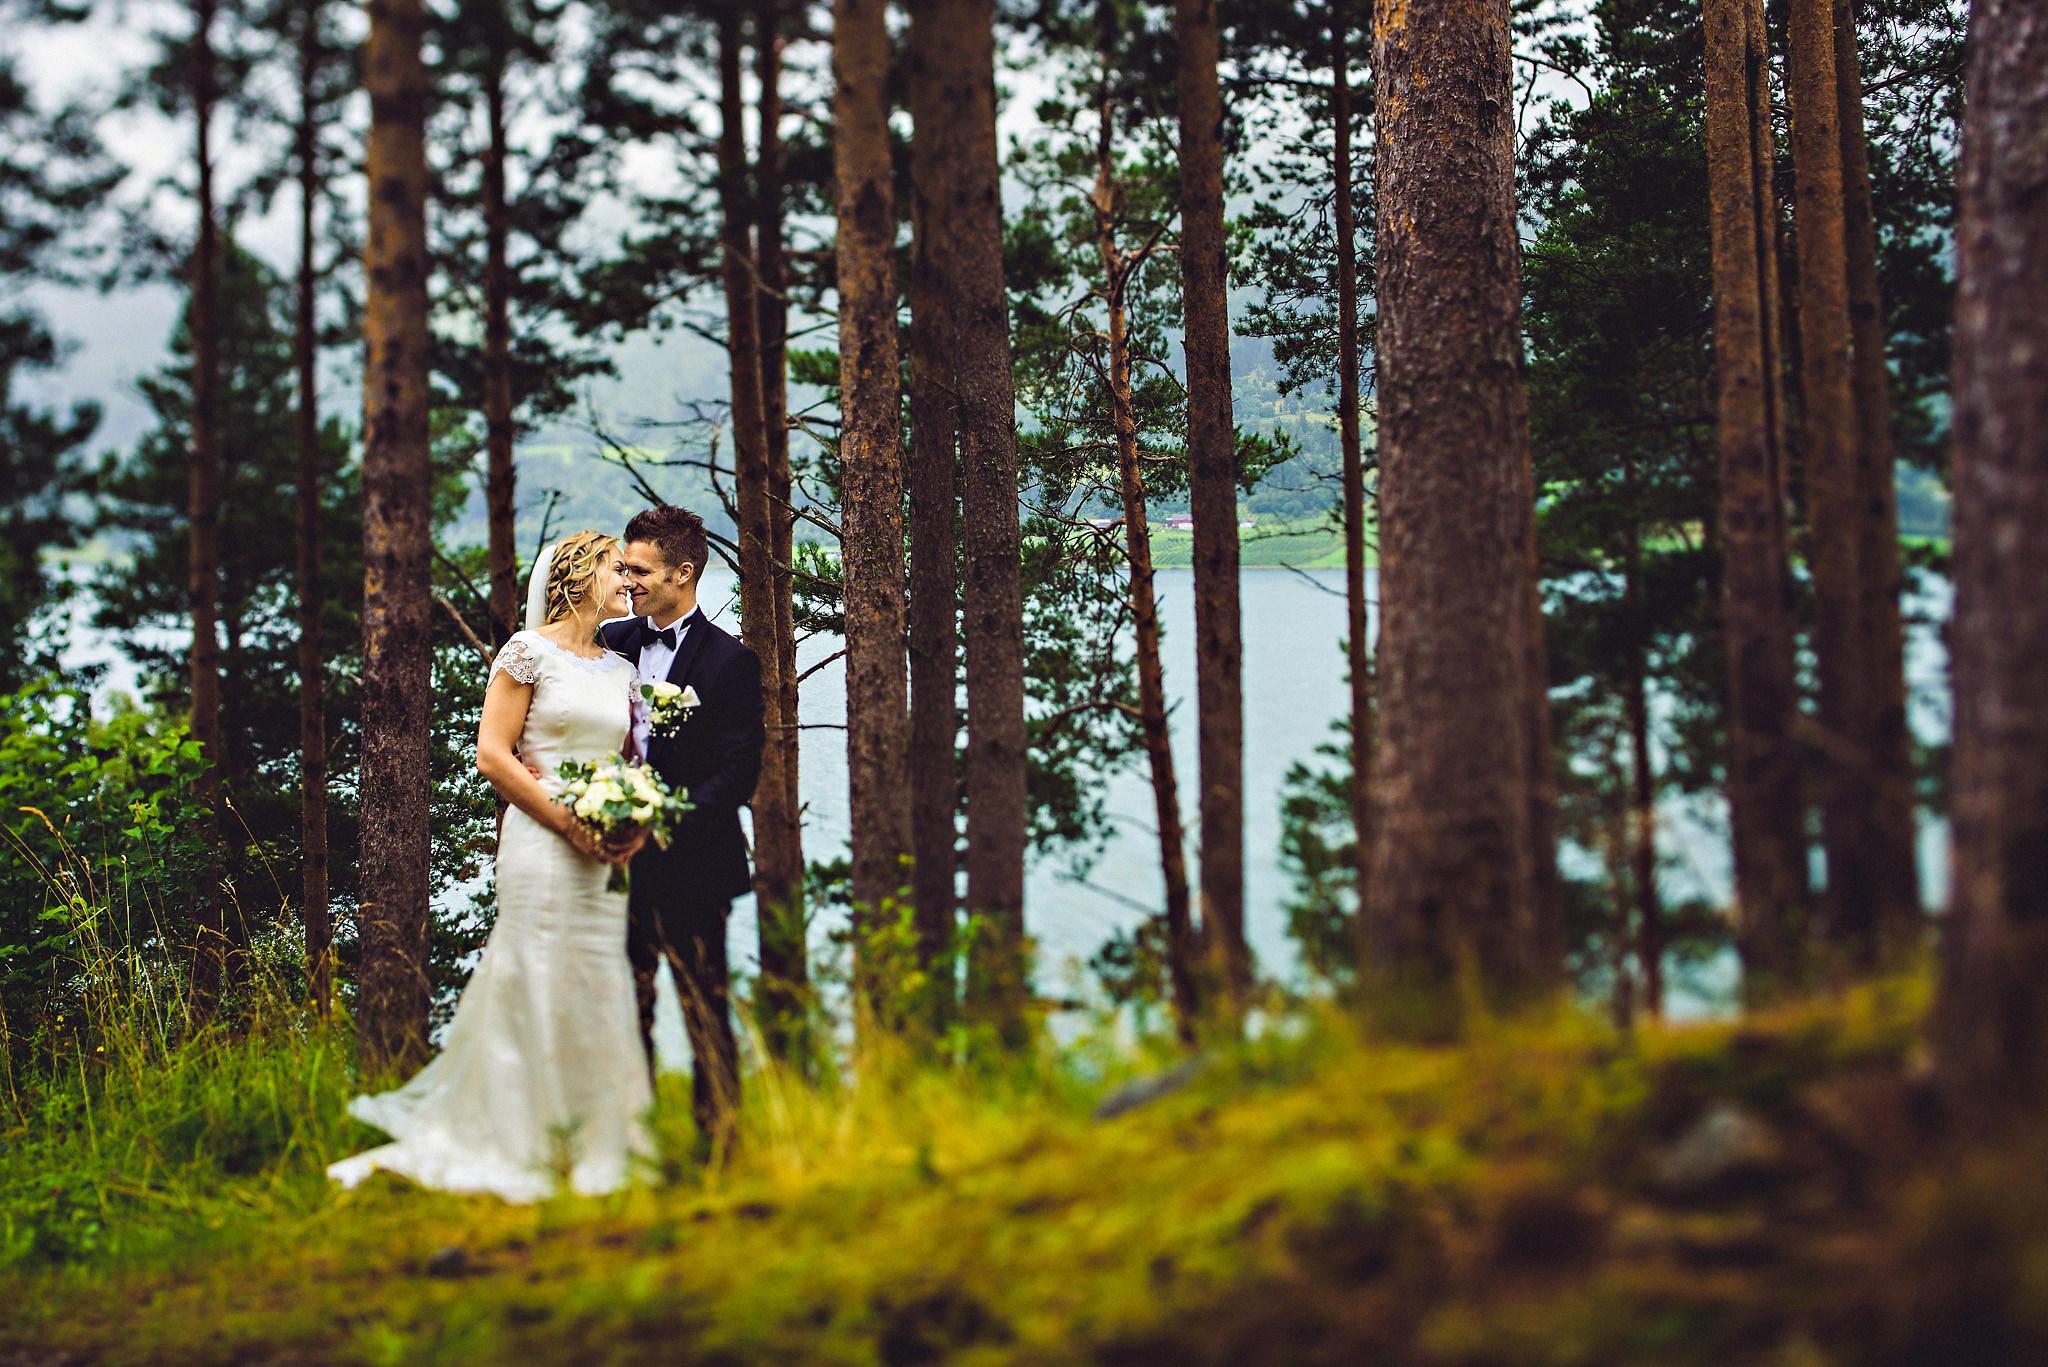 Bryllup på Yrineset i Oldedalen bryllupsfotograf sogn og fjordane-10.jpg